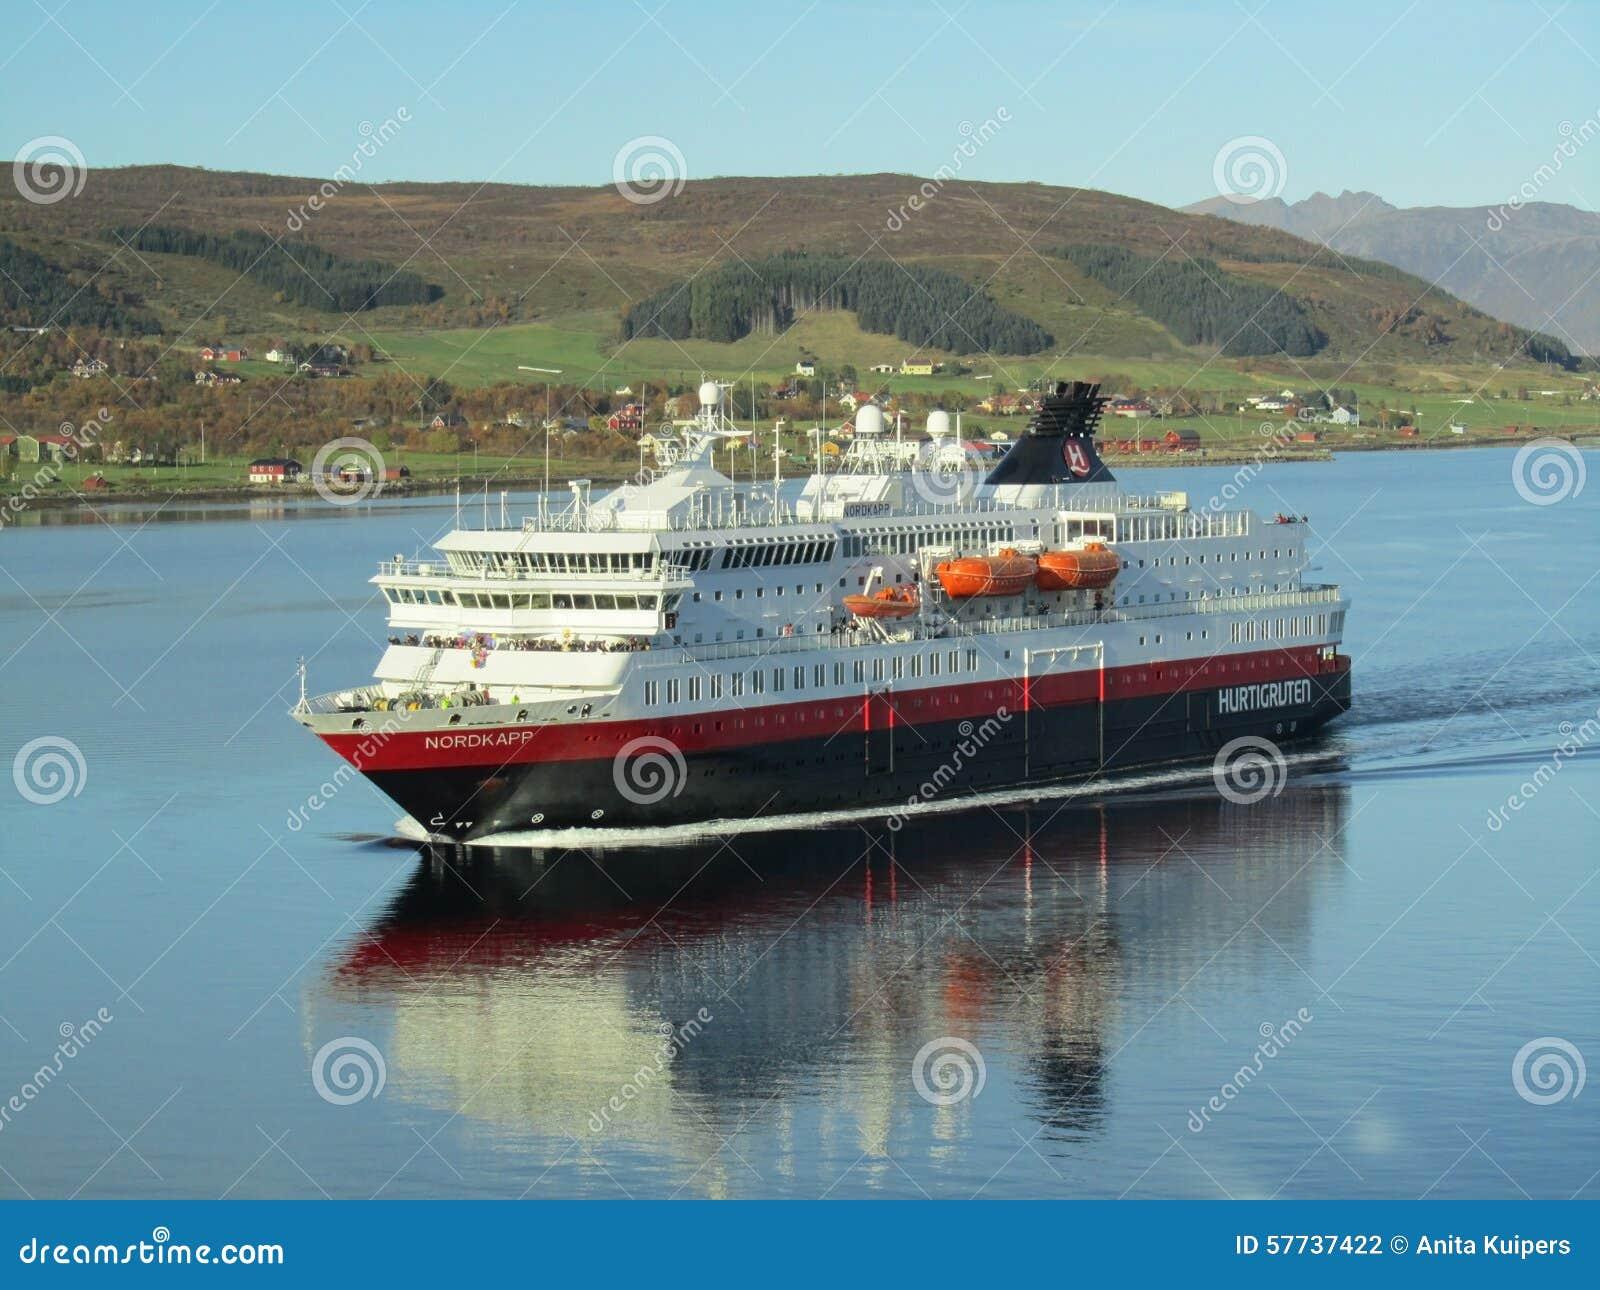 Ship norwegian hurtigruten cruising fjord